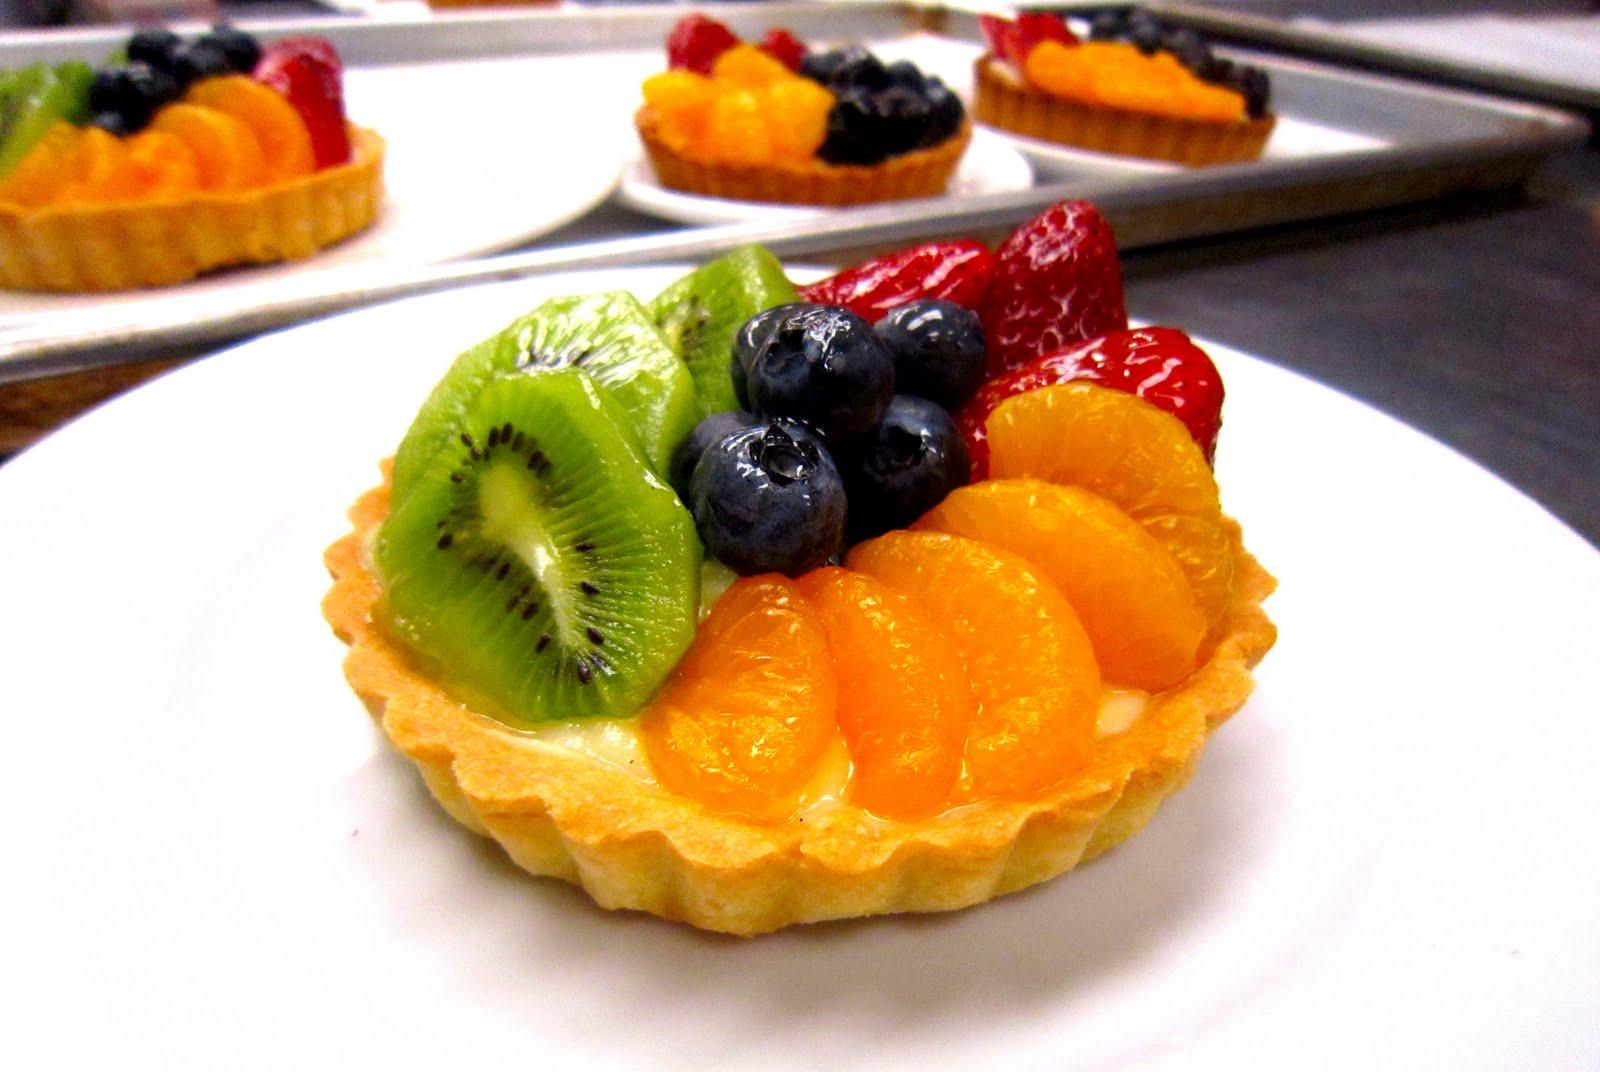 Red Mangos: La Creme Patissiere (Pastry Cream)